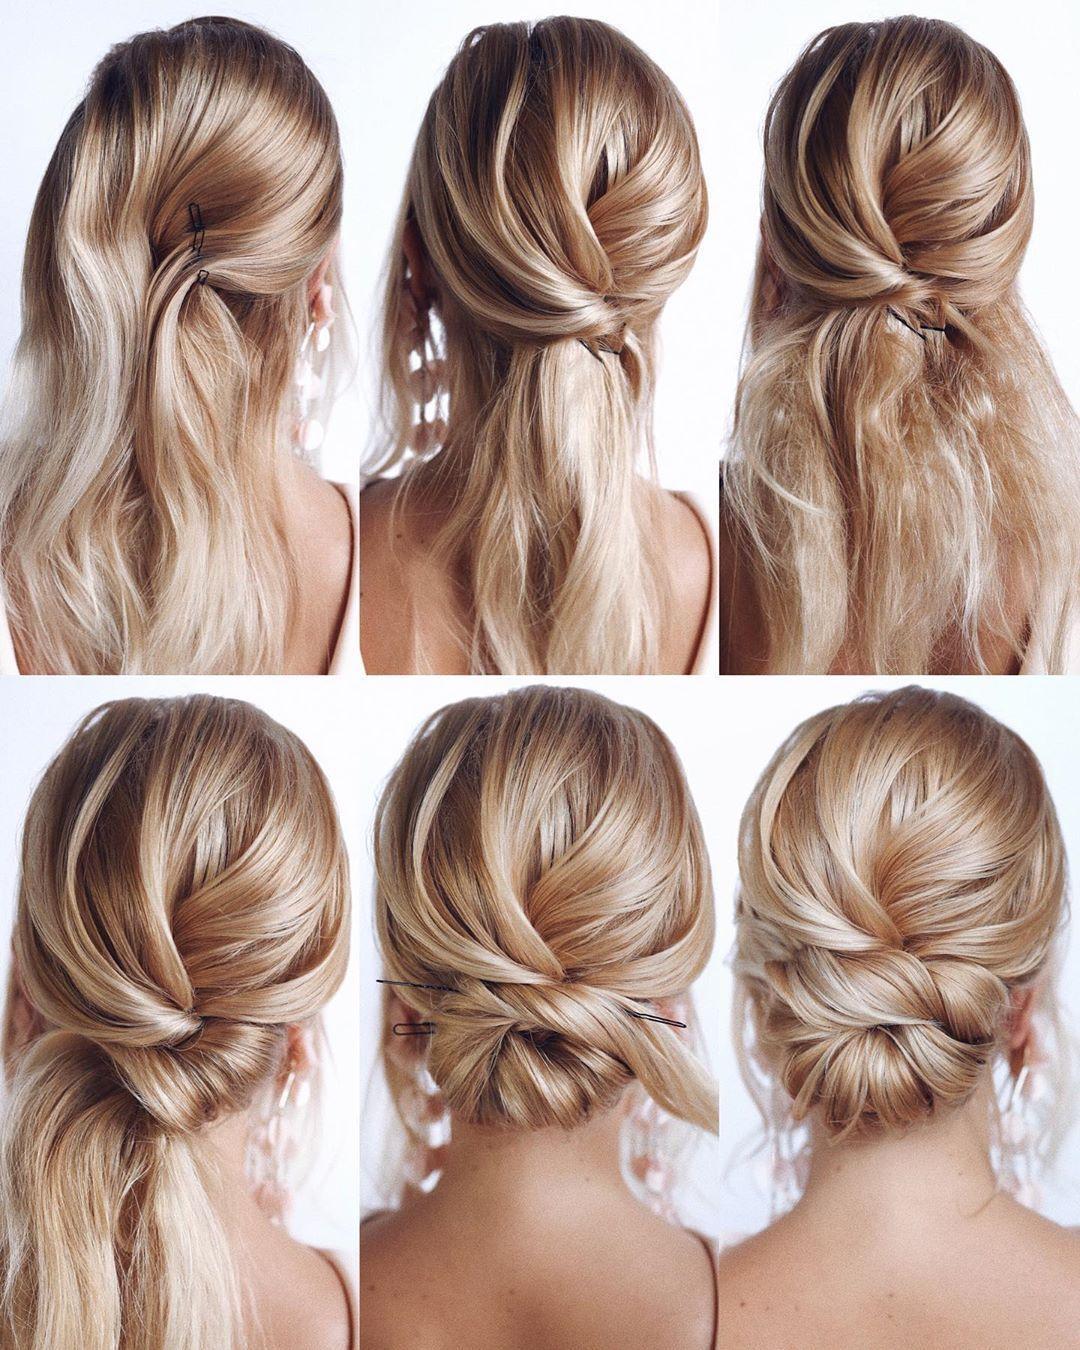 Diy Wedding Guest Hair: Pin On Medium Length Hairstyles